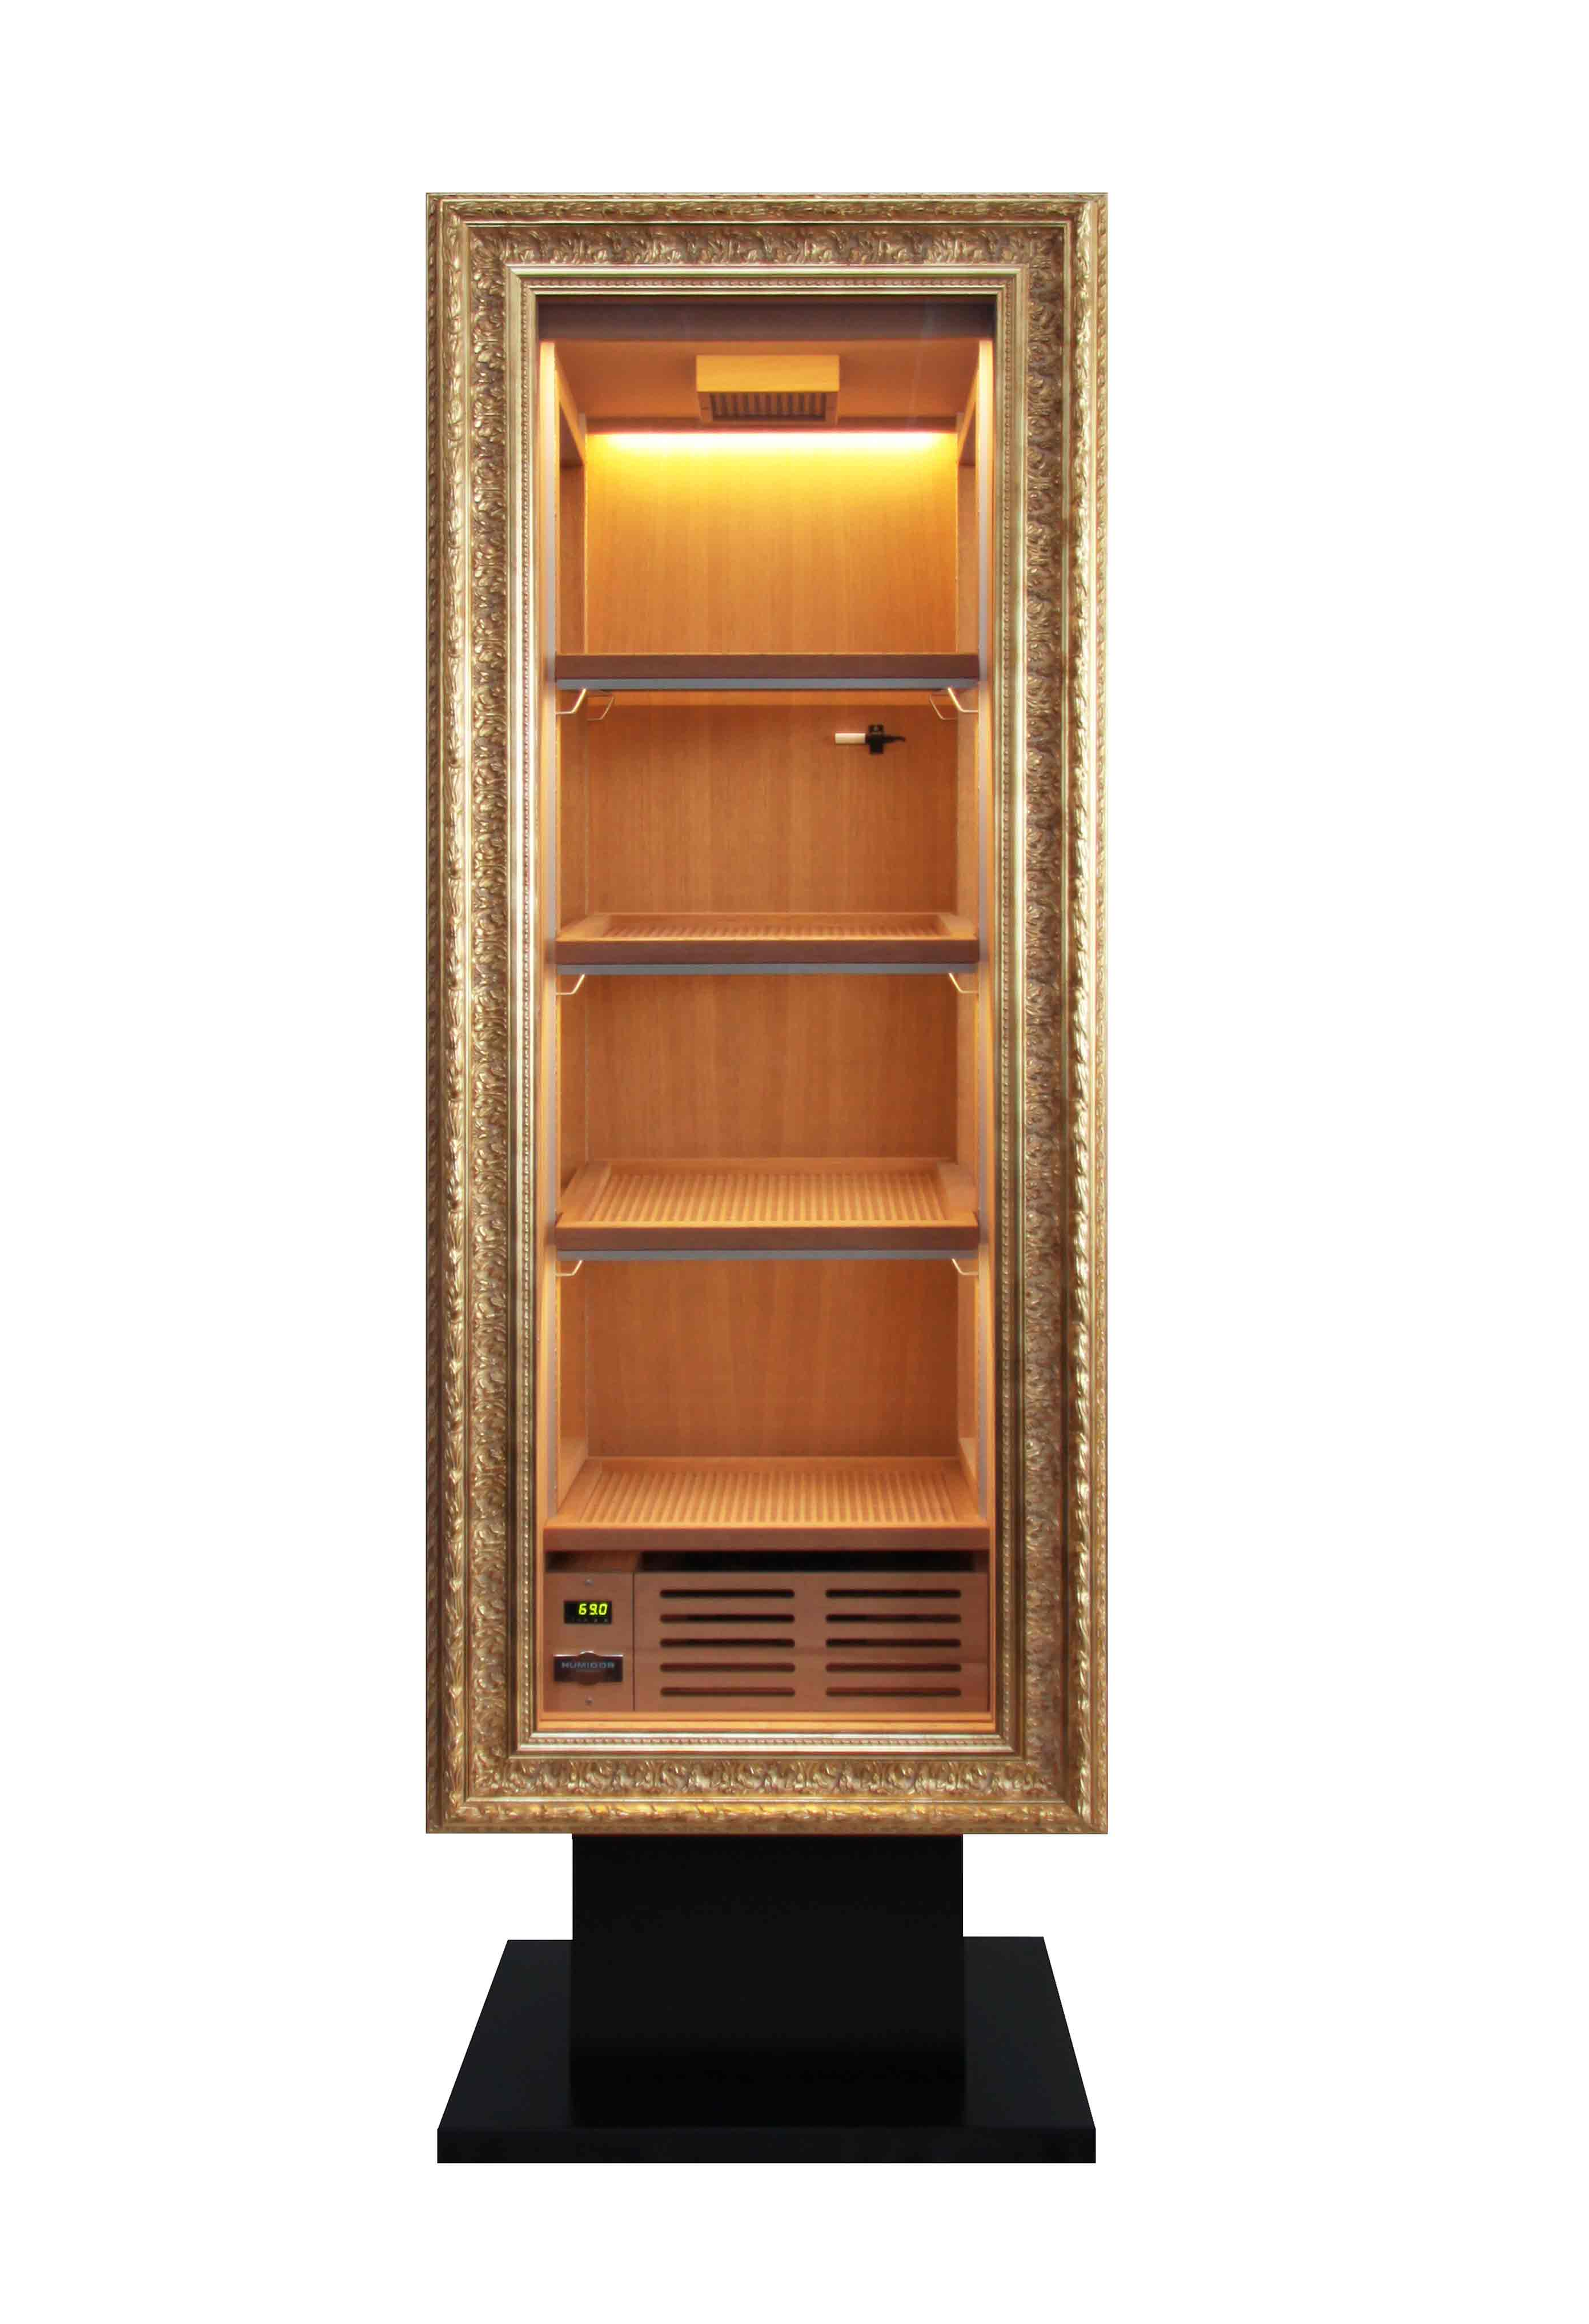 CigarArt schwarz mit goldenen Rahmen GERBER Humidor